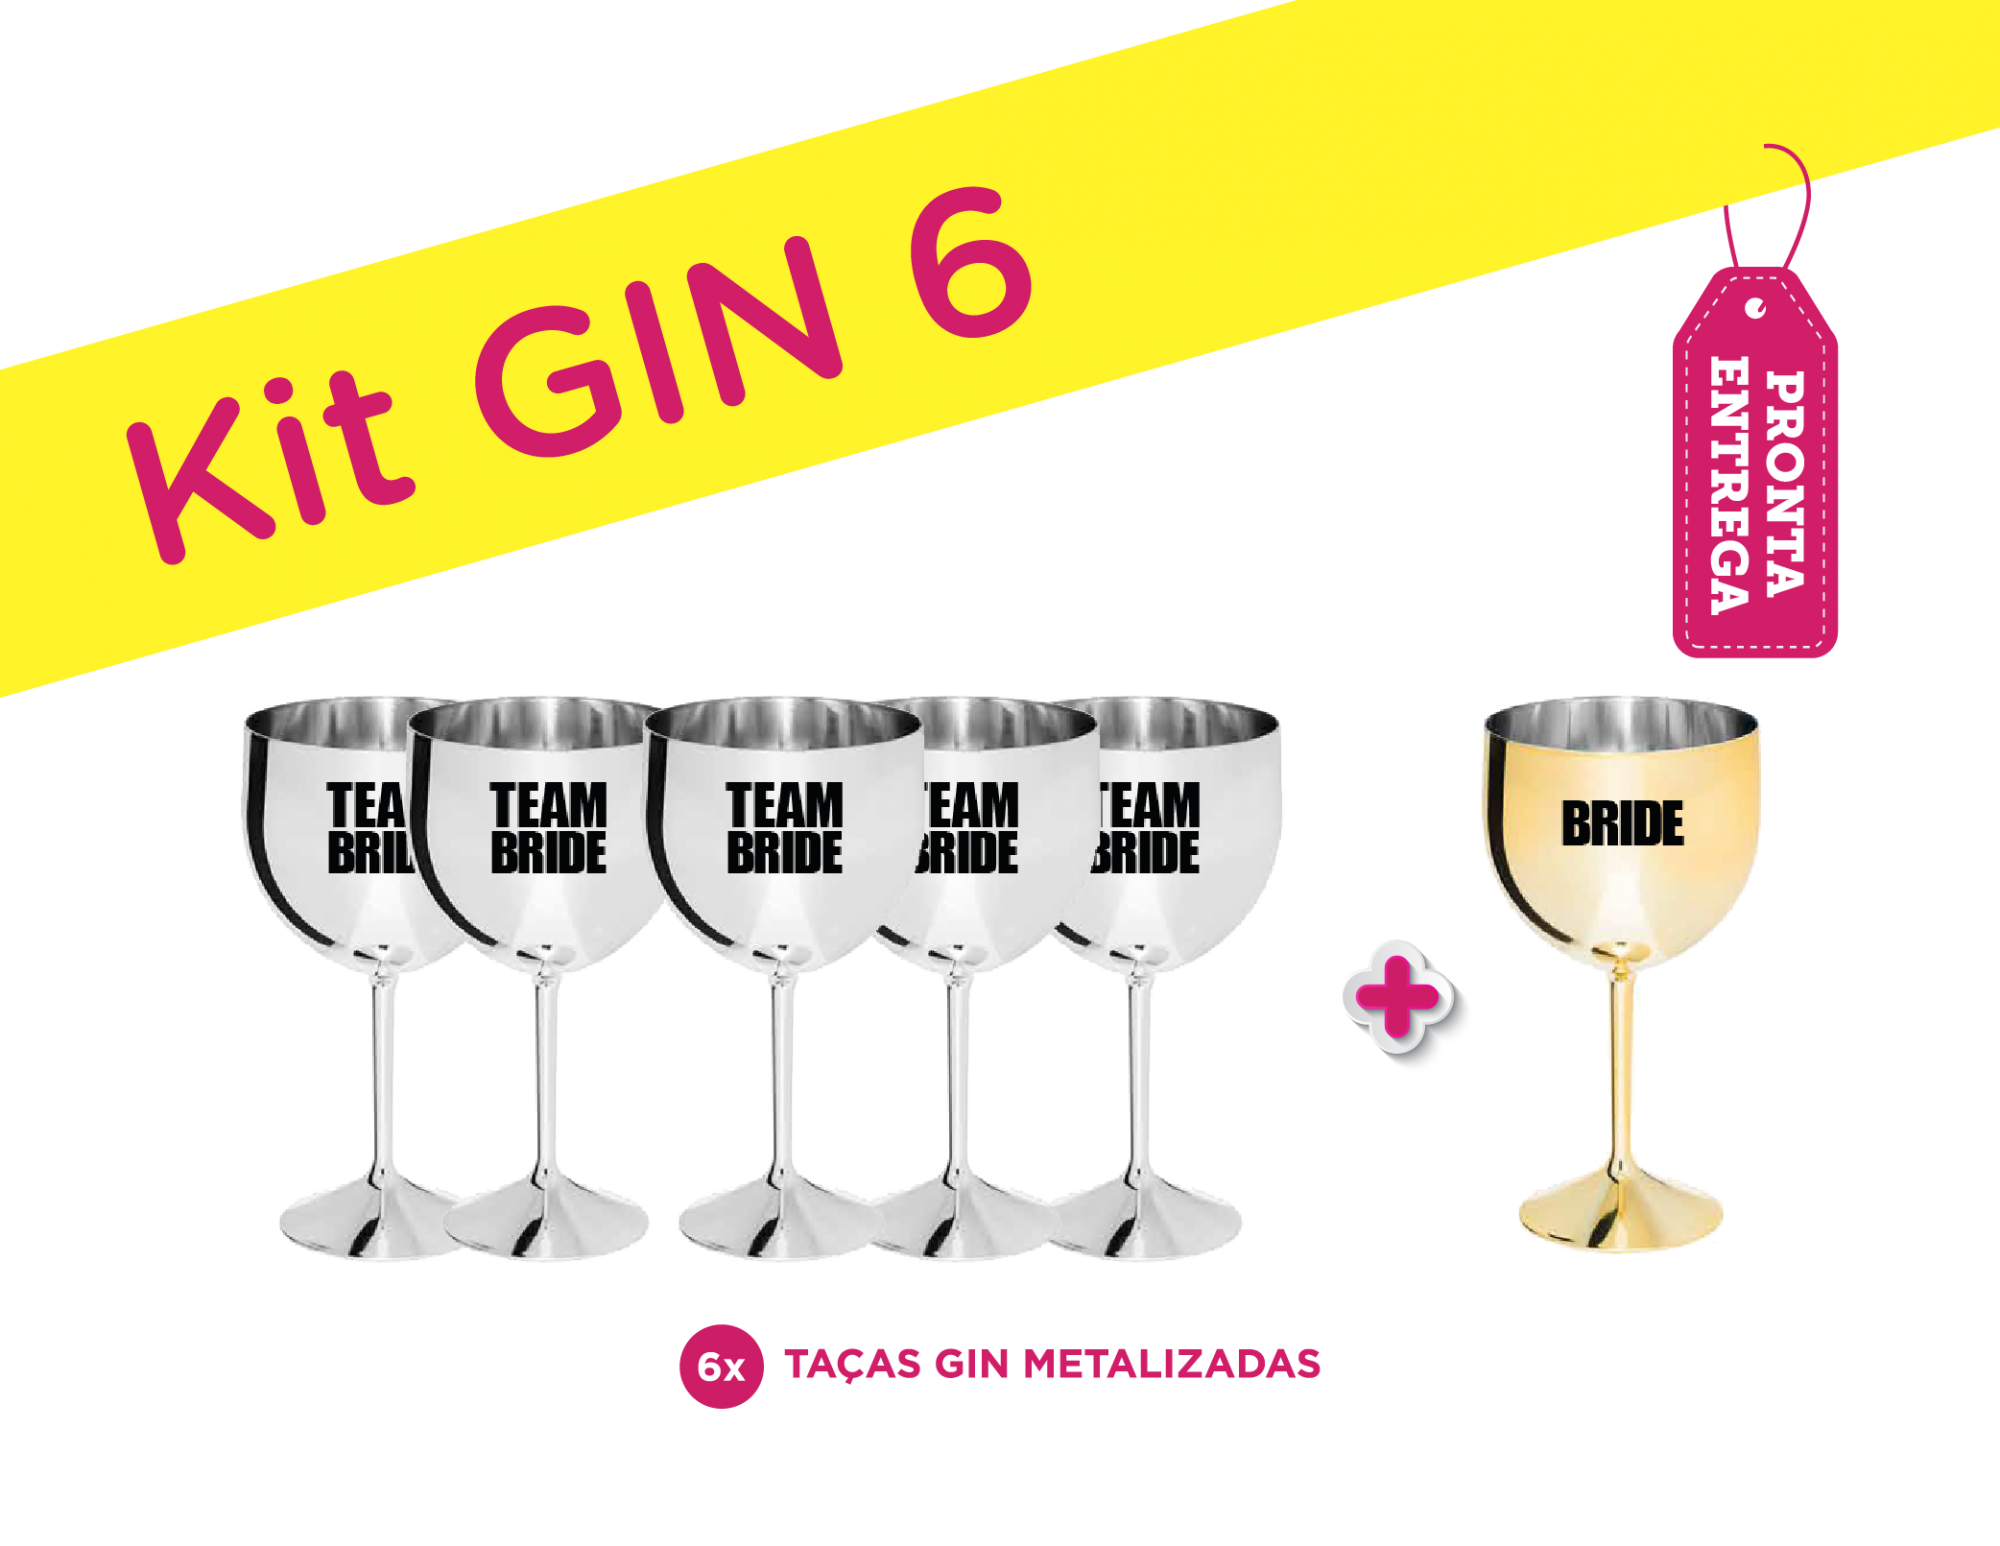 Kit Gin 6 Metalizado Bride/Team Bride Pronta Entrega para Despedida de Solteira